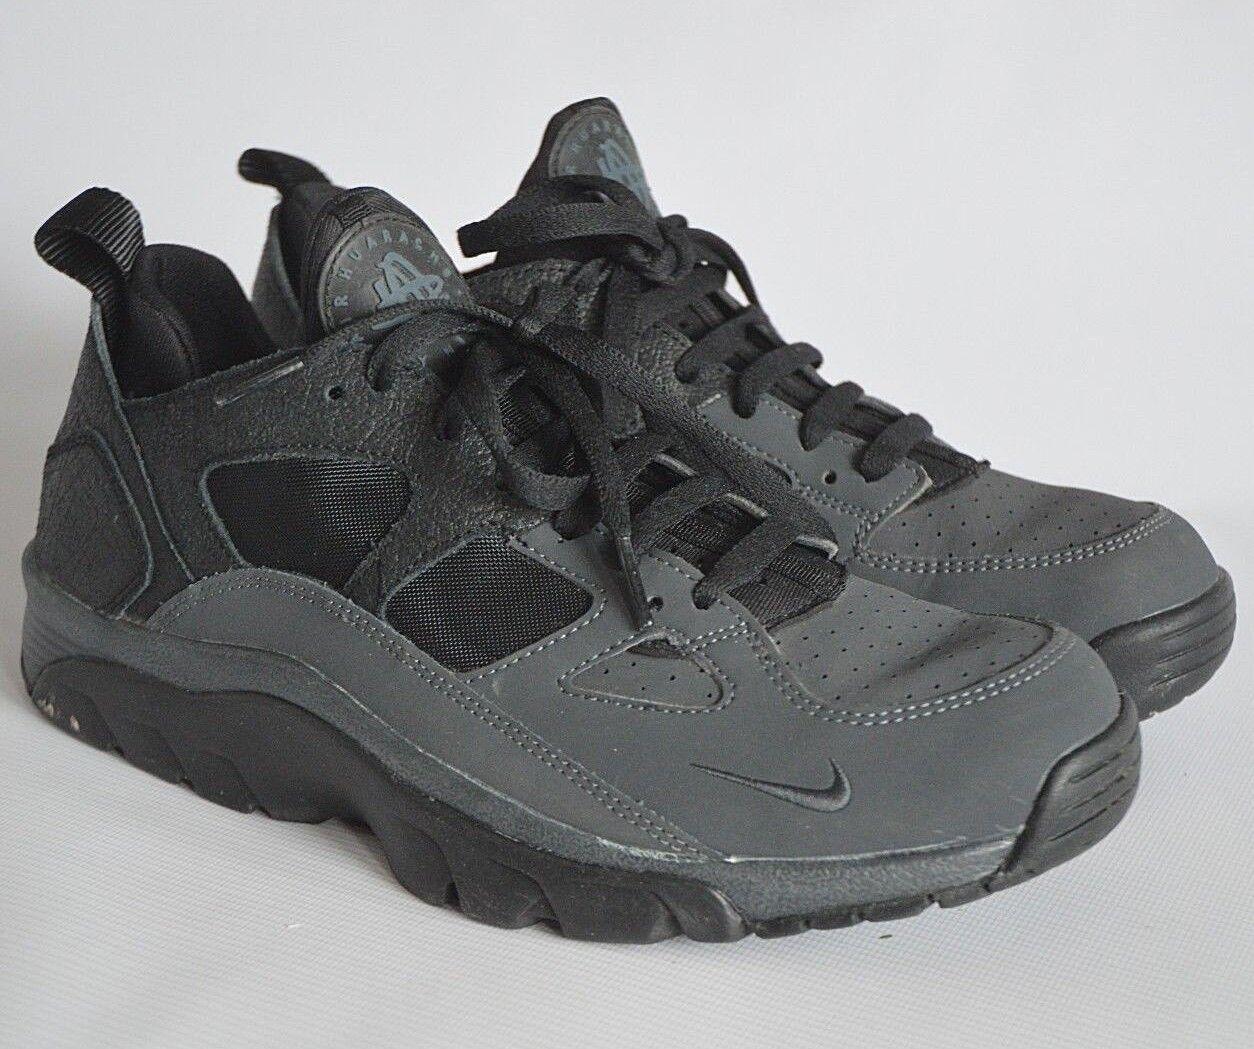 Nike Air Huarache Low 749447-099 Noir/Anthracite Baskets UK 8/US 9/EU 42.5